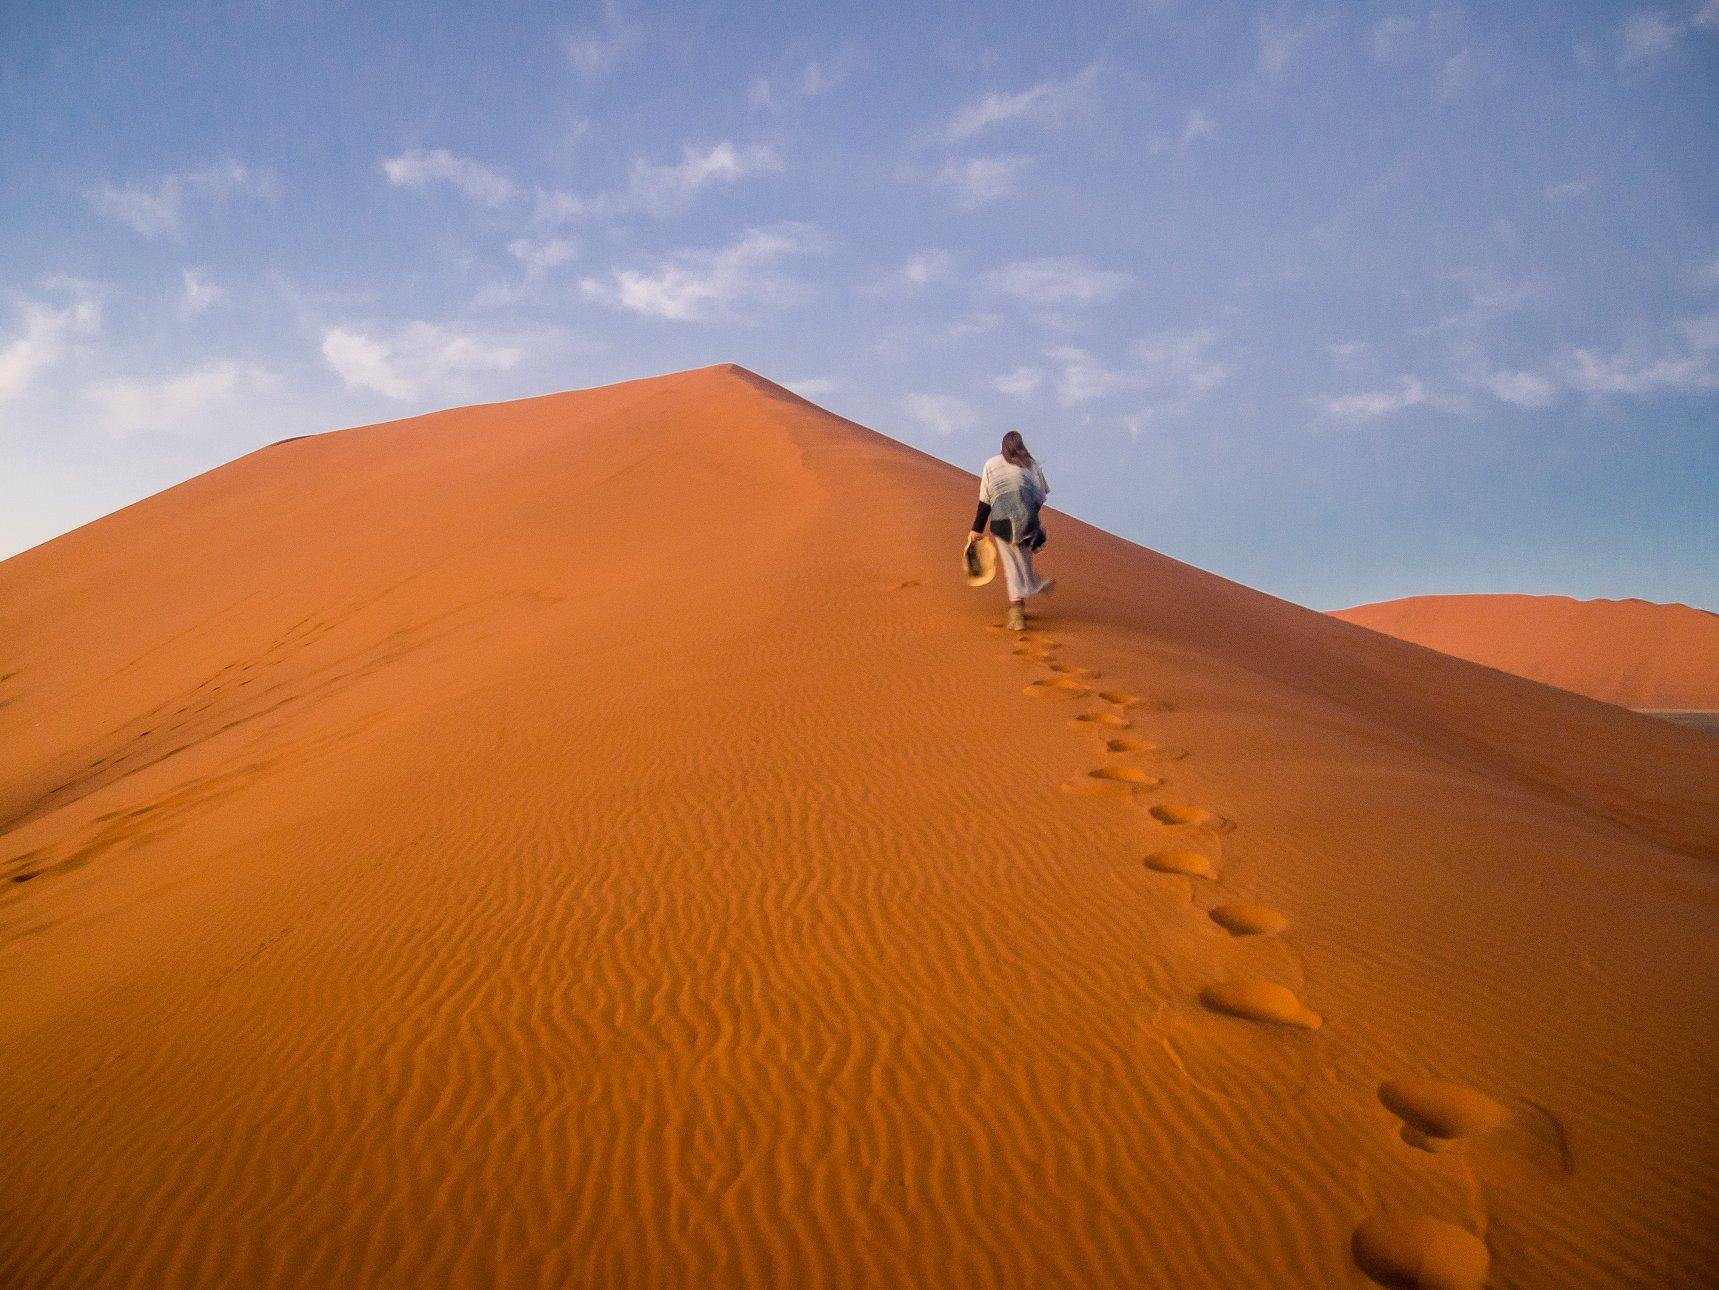 Dune 45 in Sossuvlei, Namibia